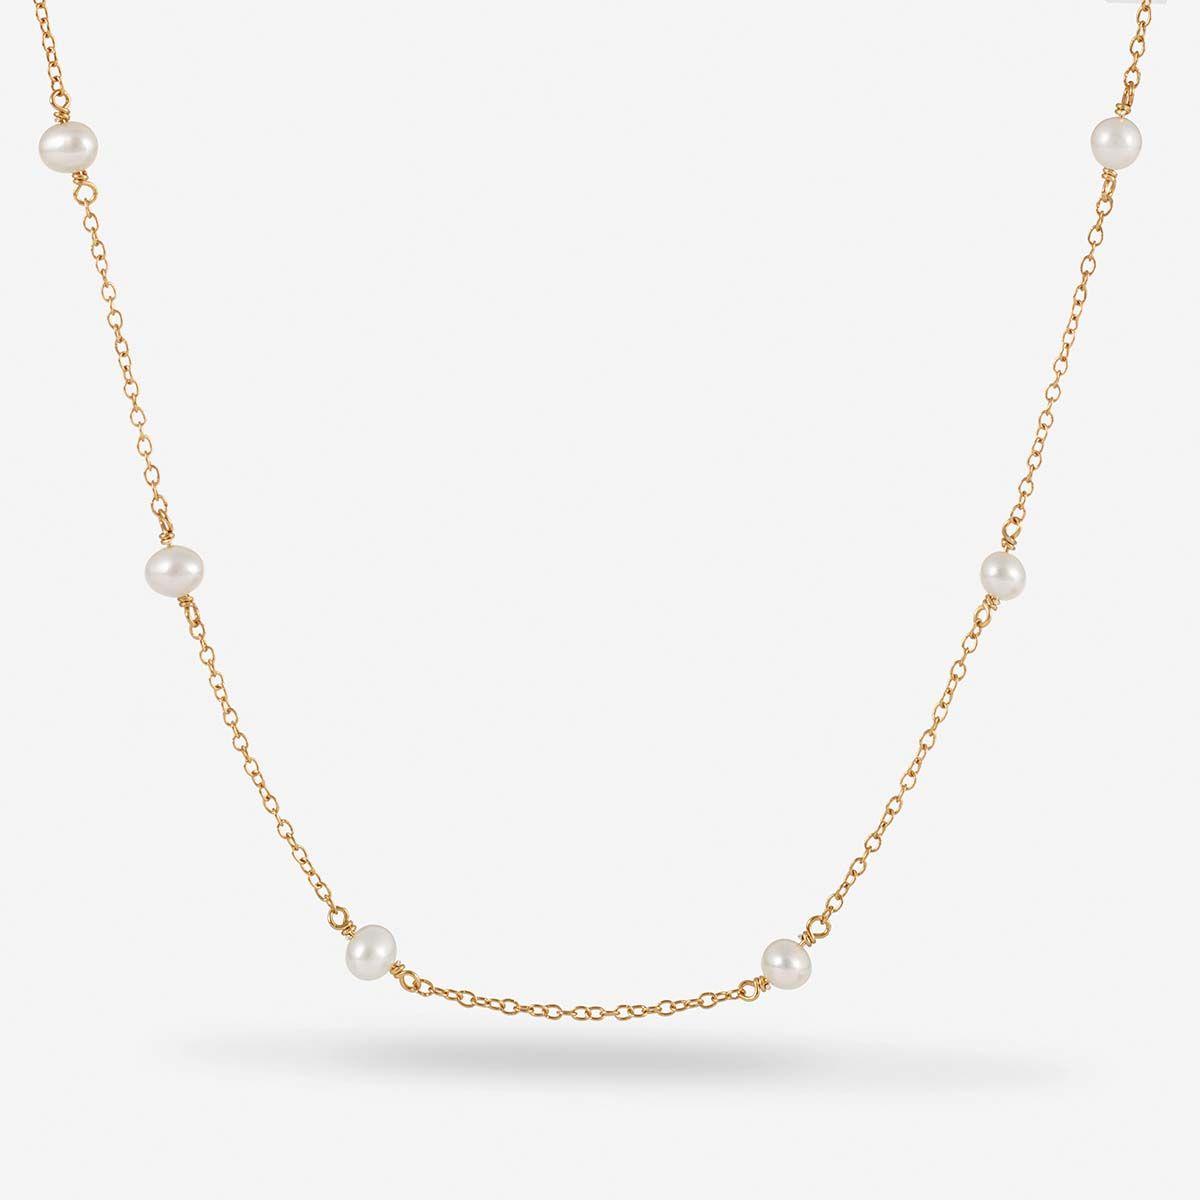 Roxy - Perlenketten - 18k vergoldet